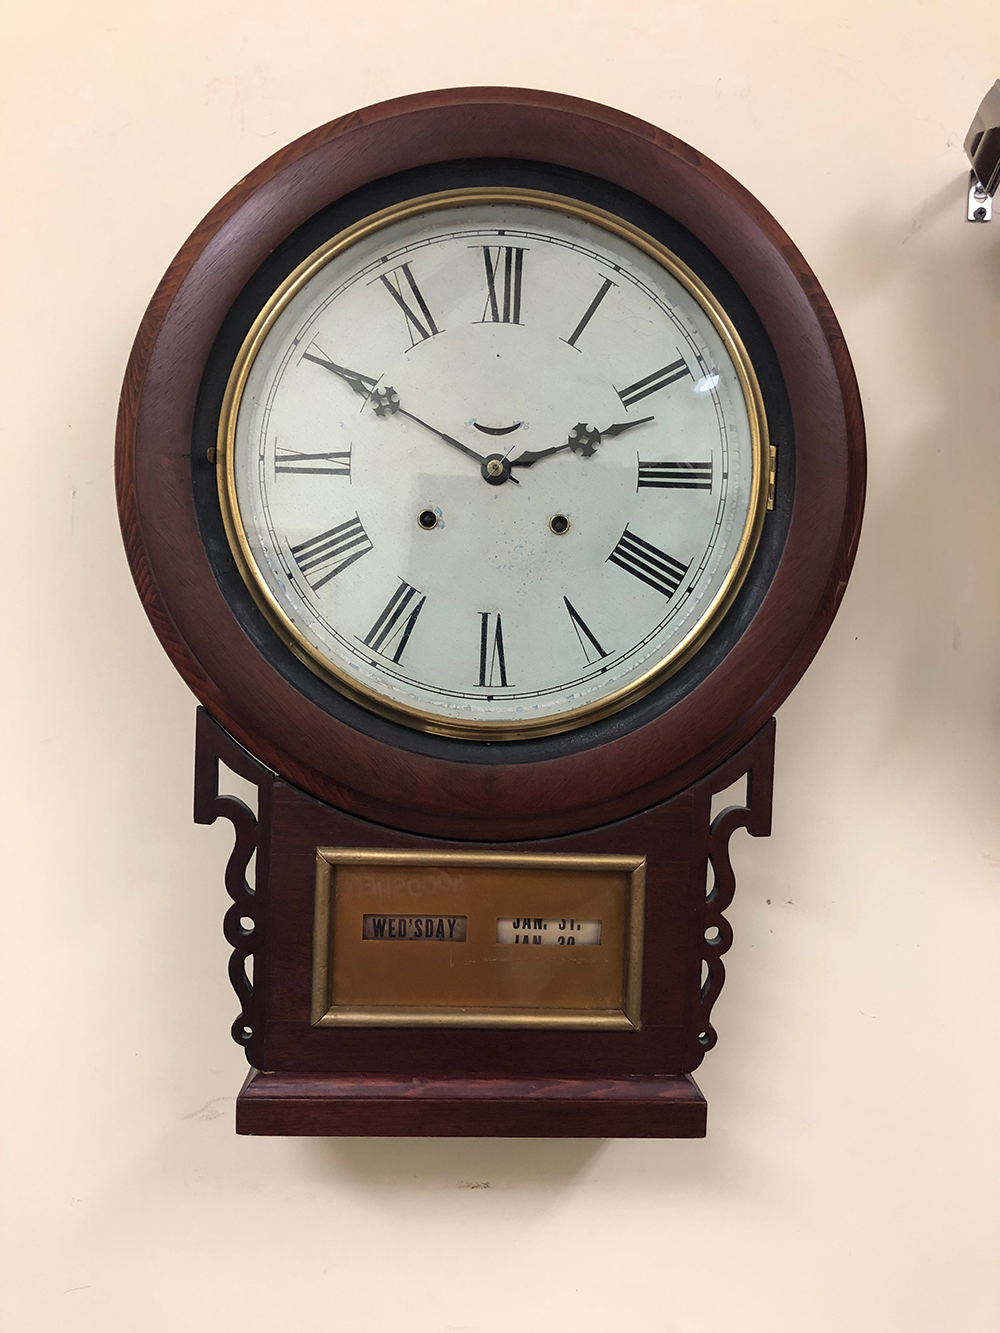 Very Rare Jerome Calendar Wall Clock